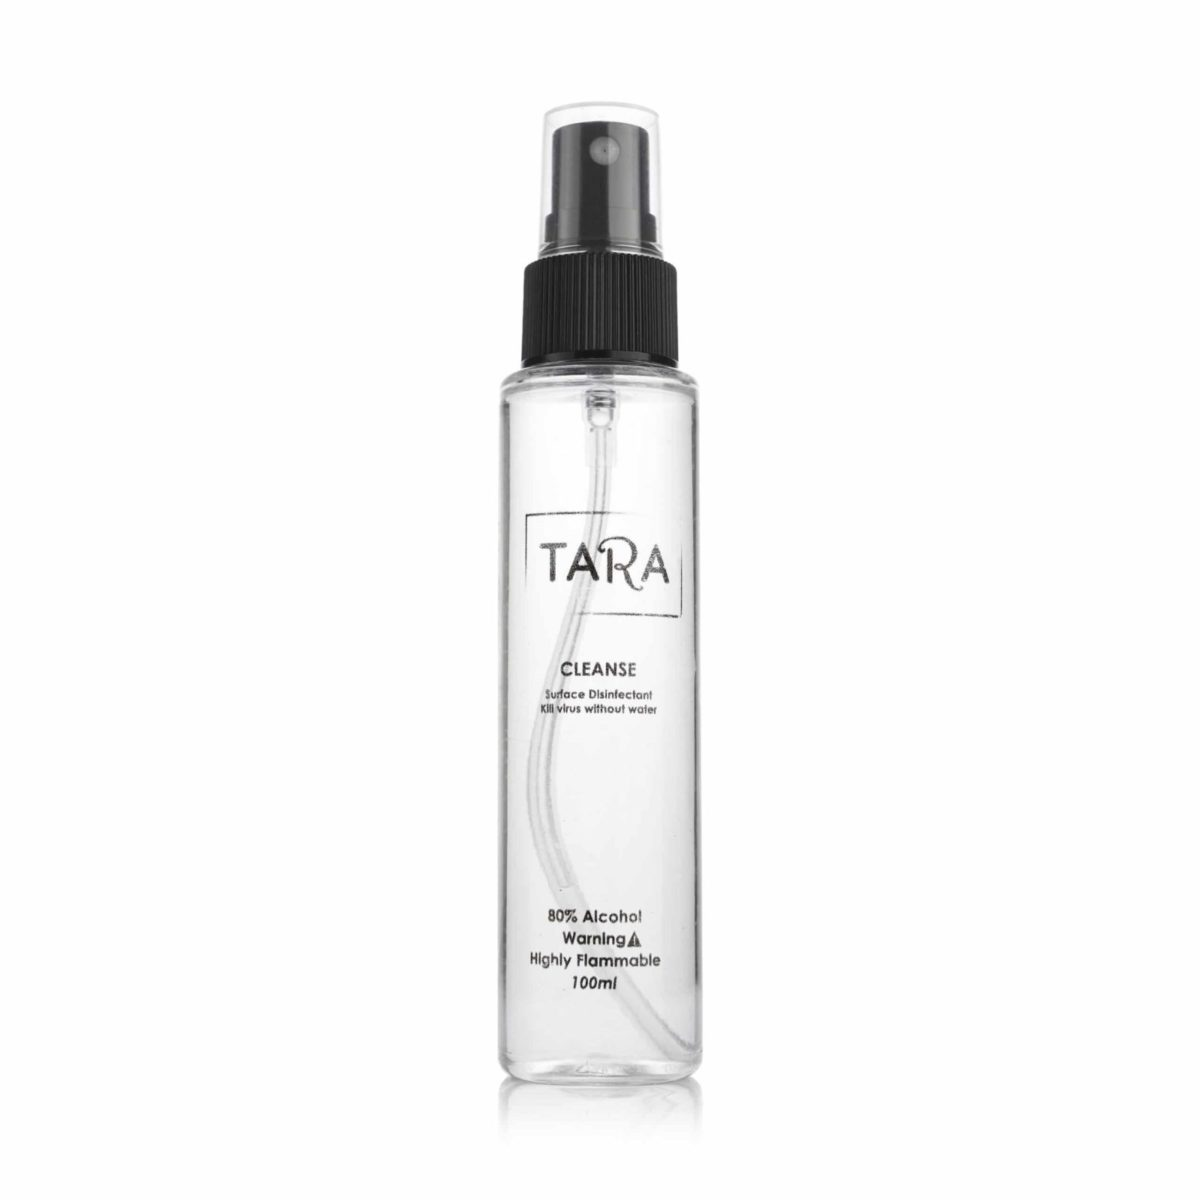 tara surface cleaner